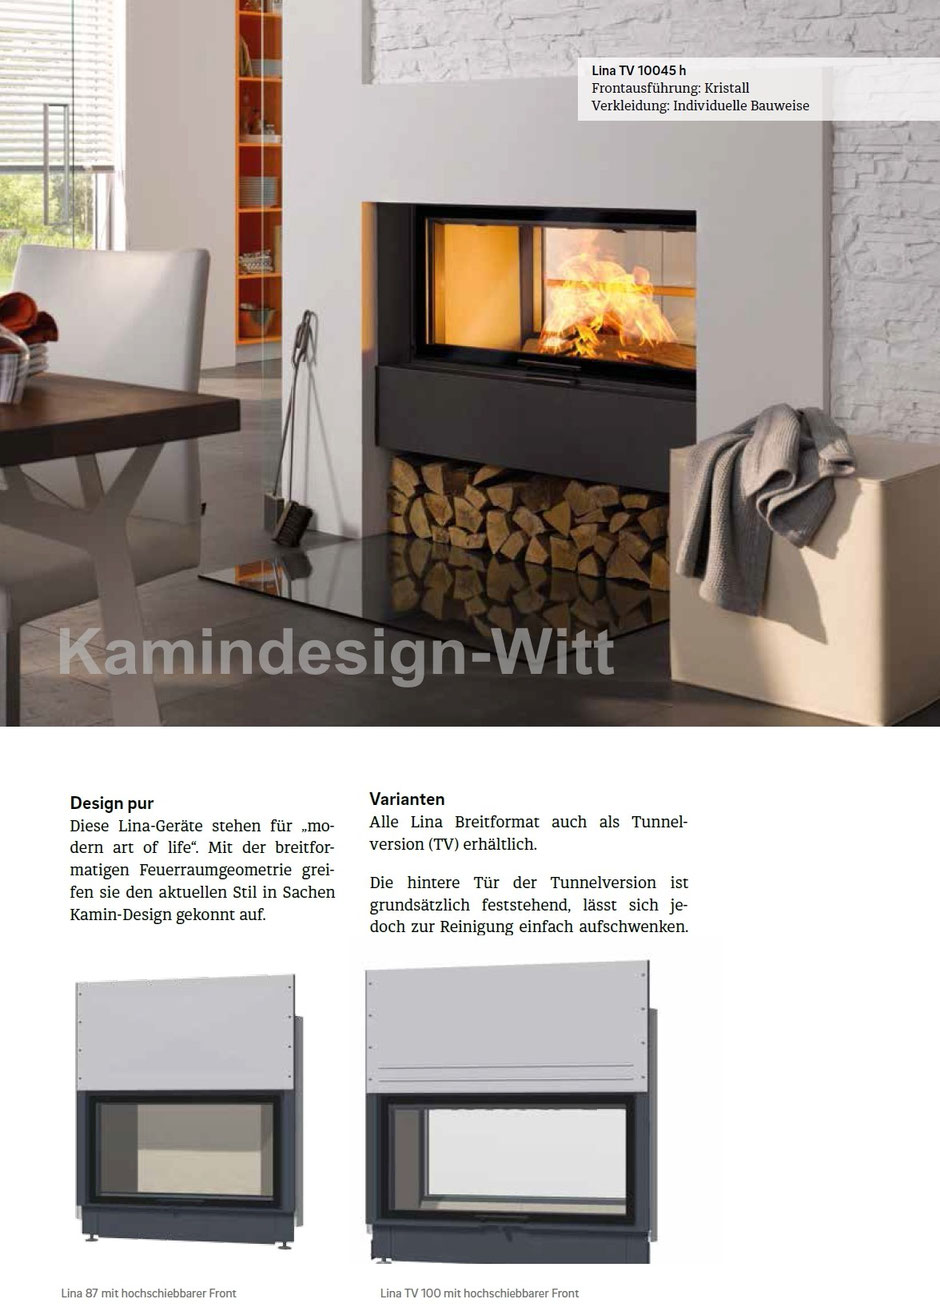 Schmid-Lina-73-65-Kamineinsatz